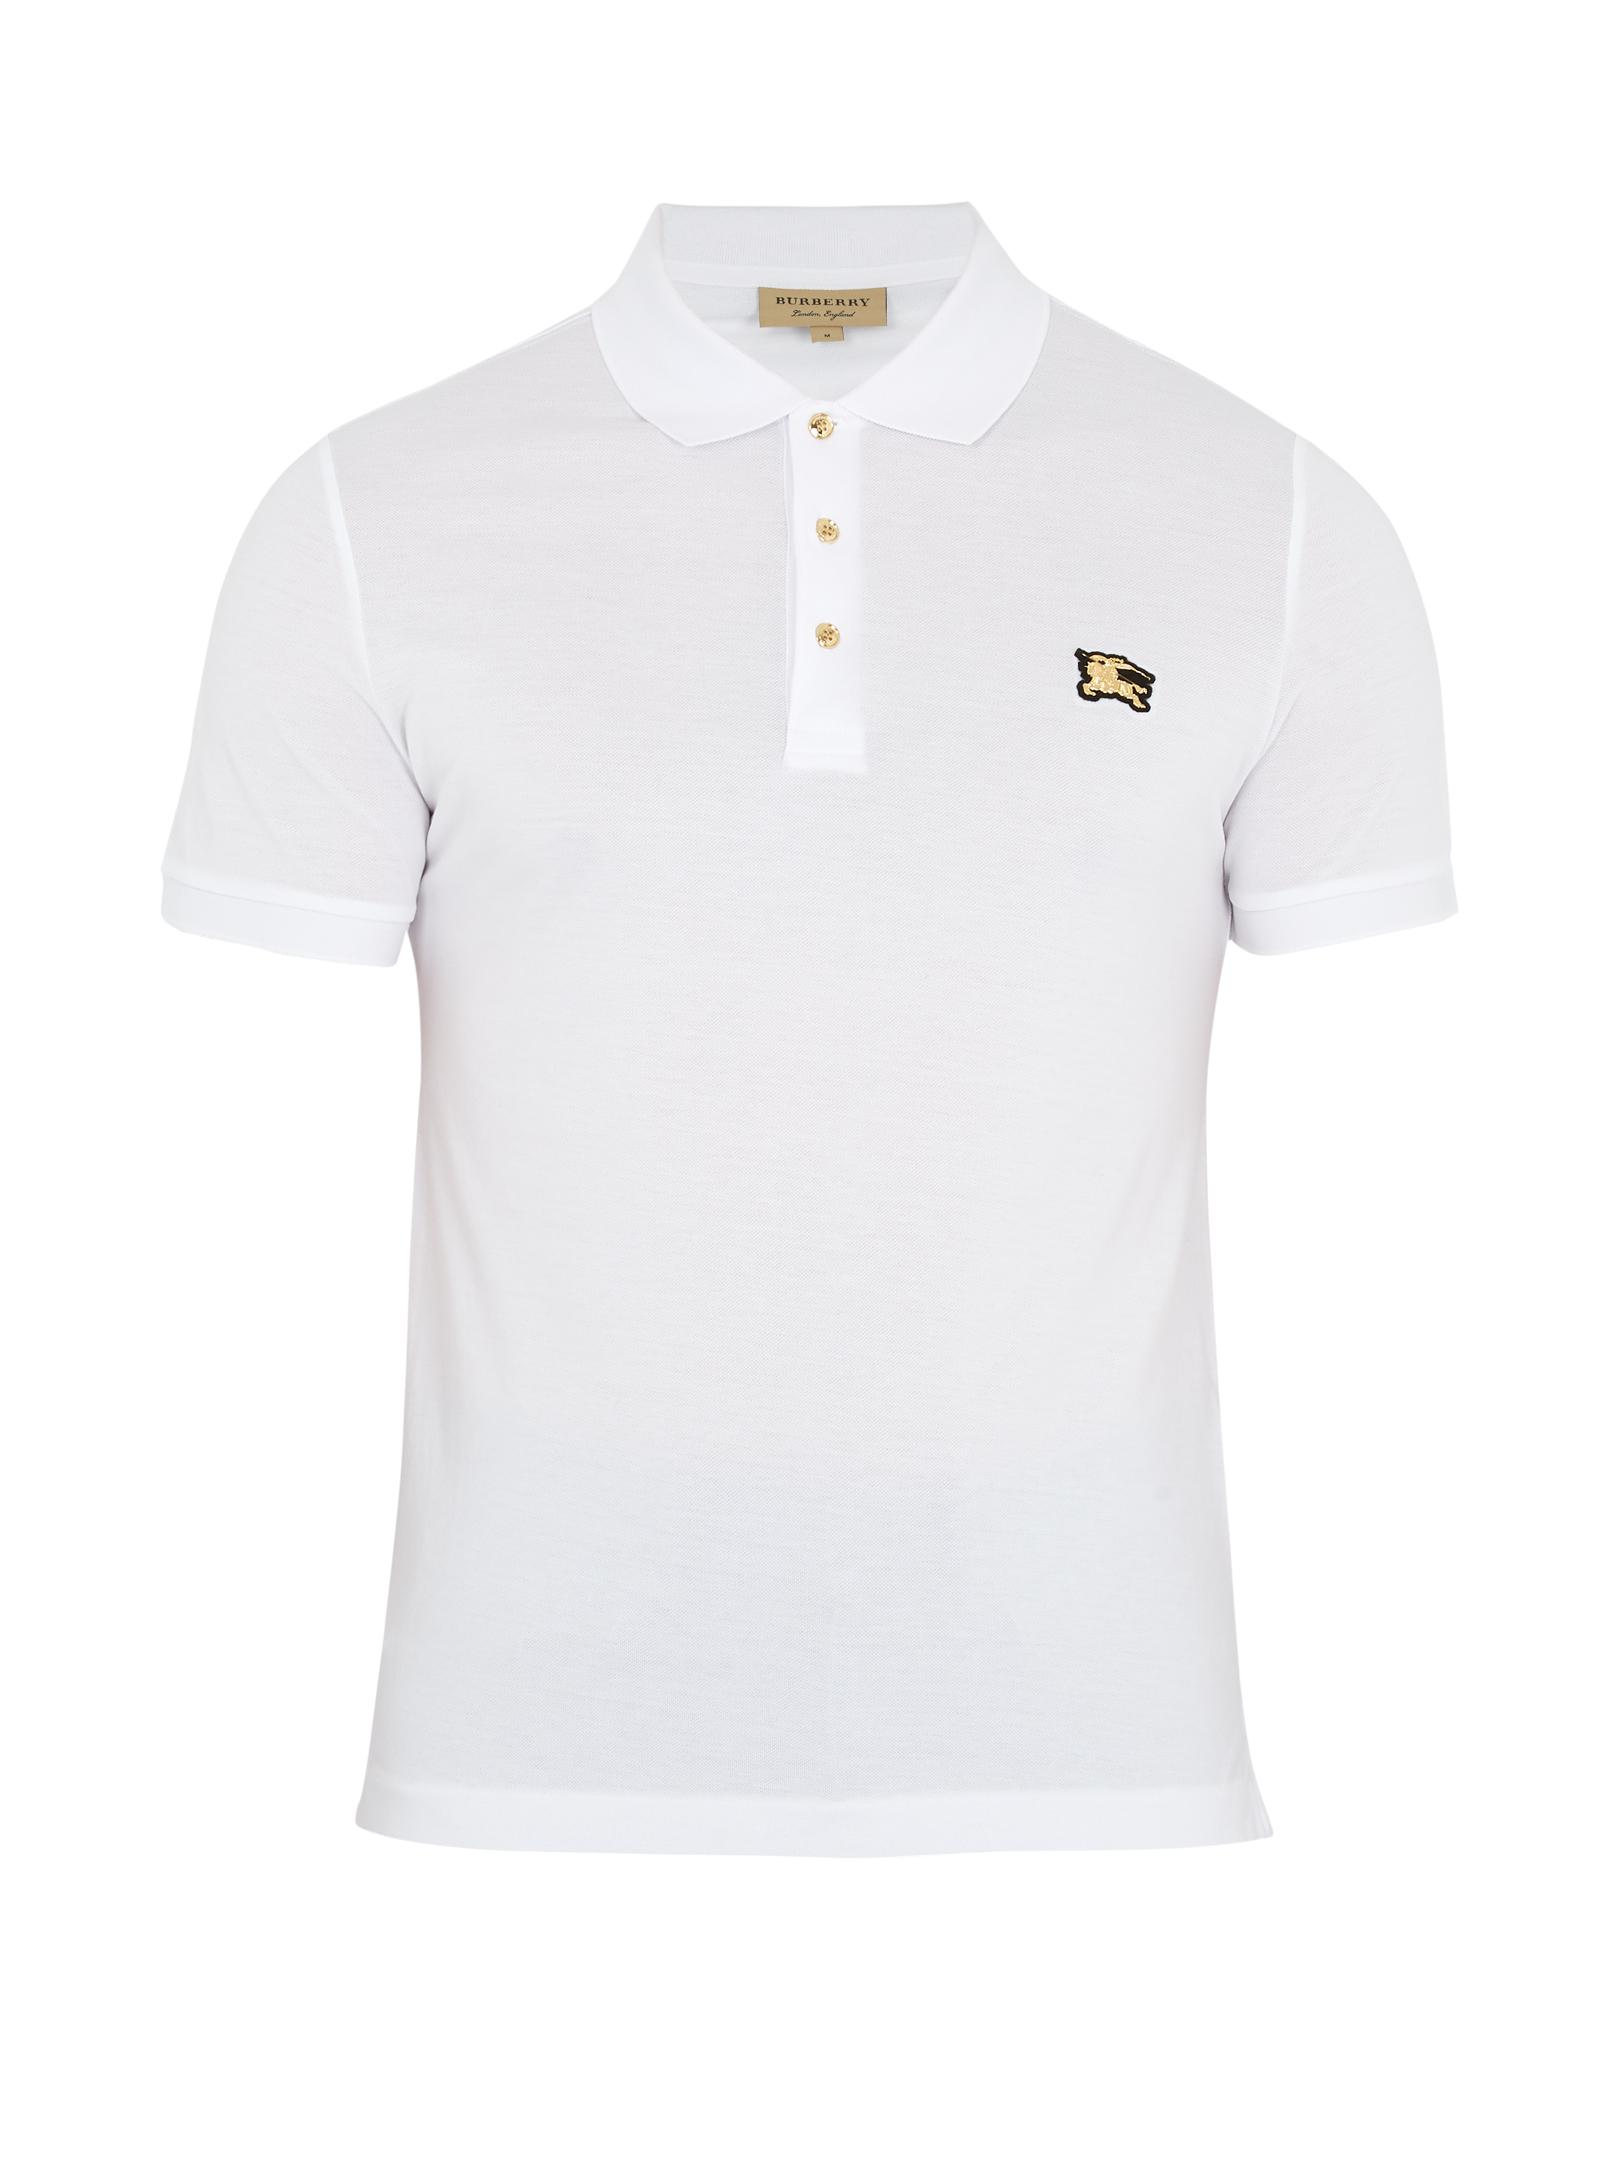 Sport Stripe Oversized Polo Shirt - Black Burberry Shop 3dsngawQ5